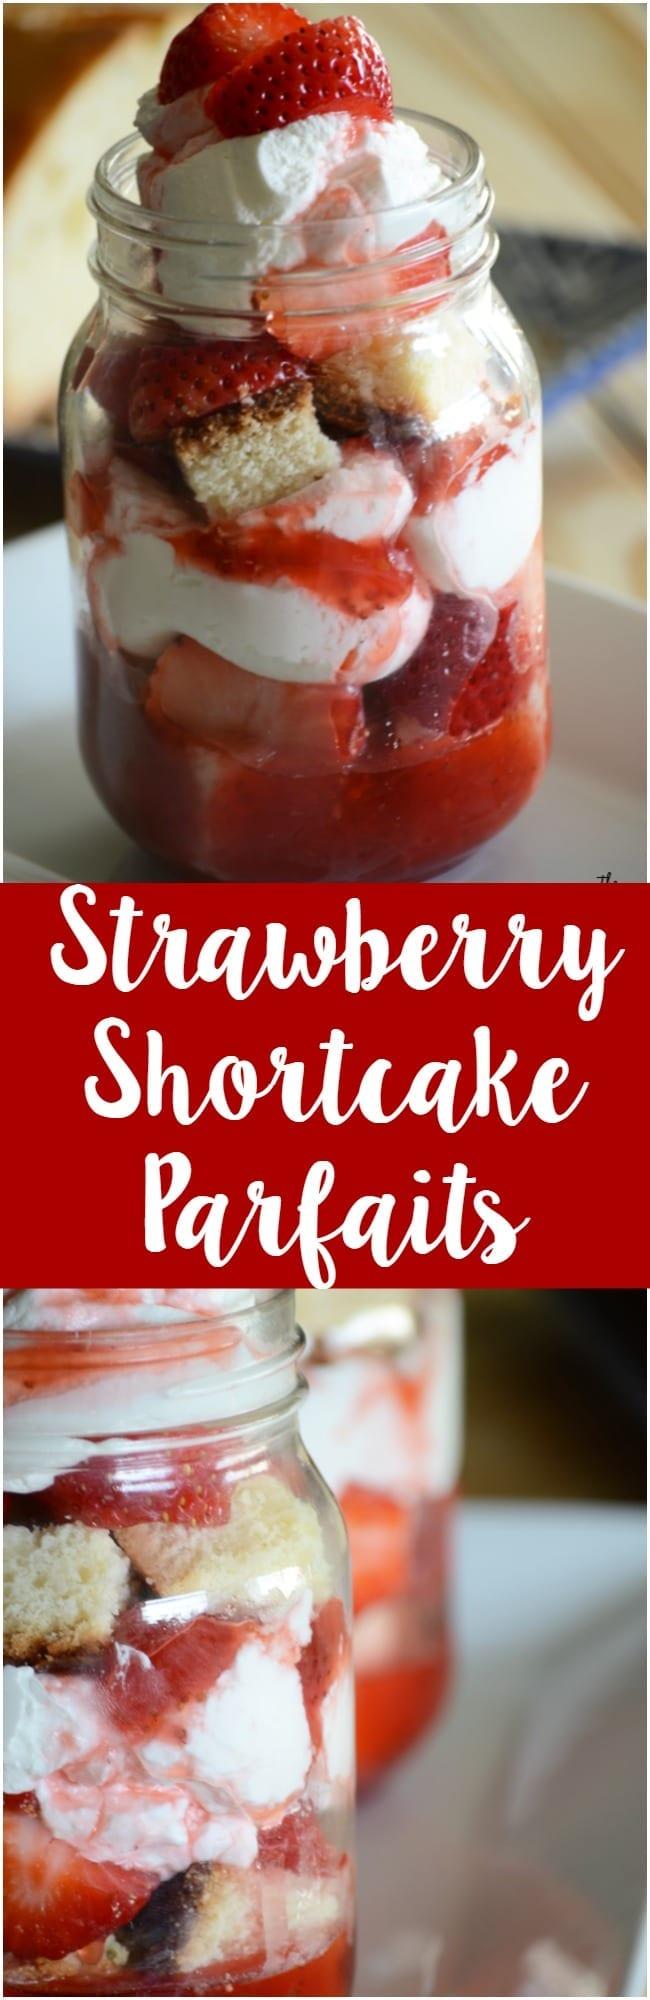 Homemade strawberry shortcake parfaits!